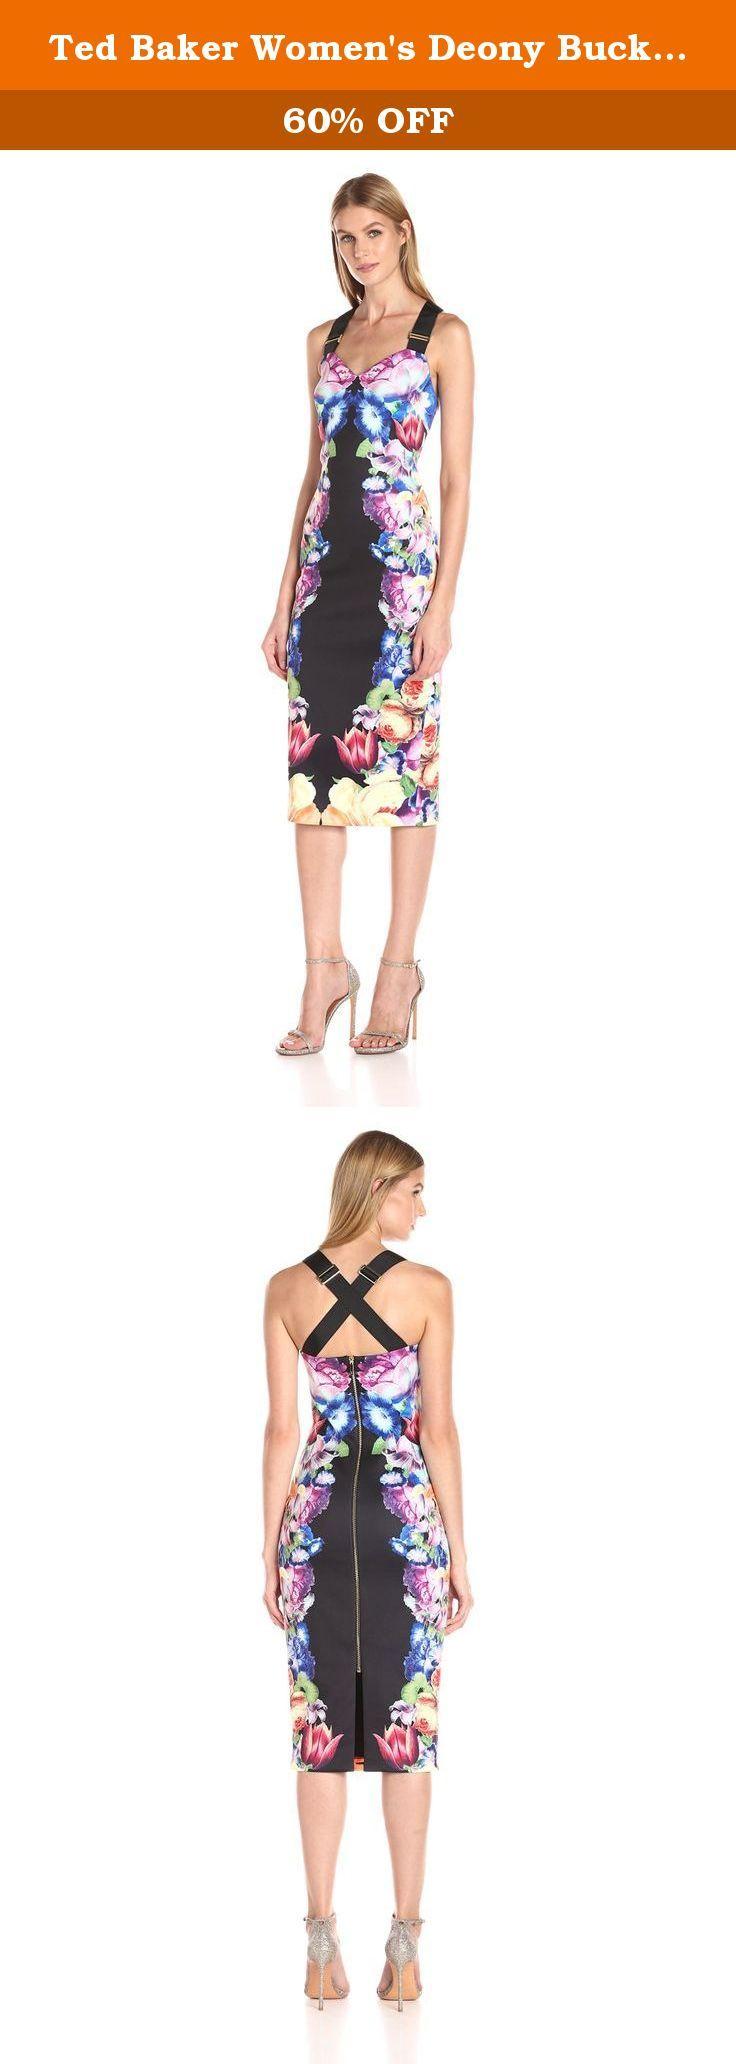 e83d337e73e65 Ted Baker Women s Deony Buckle Detailed Dress